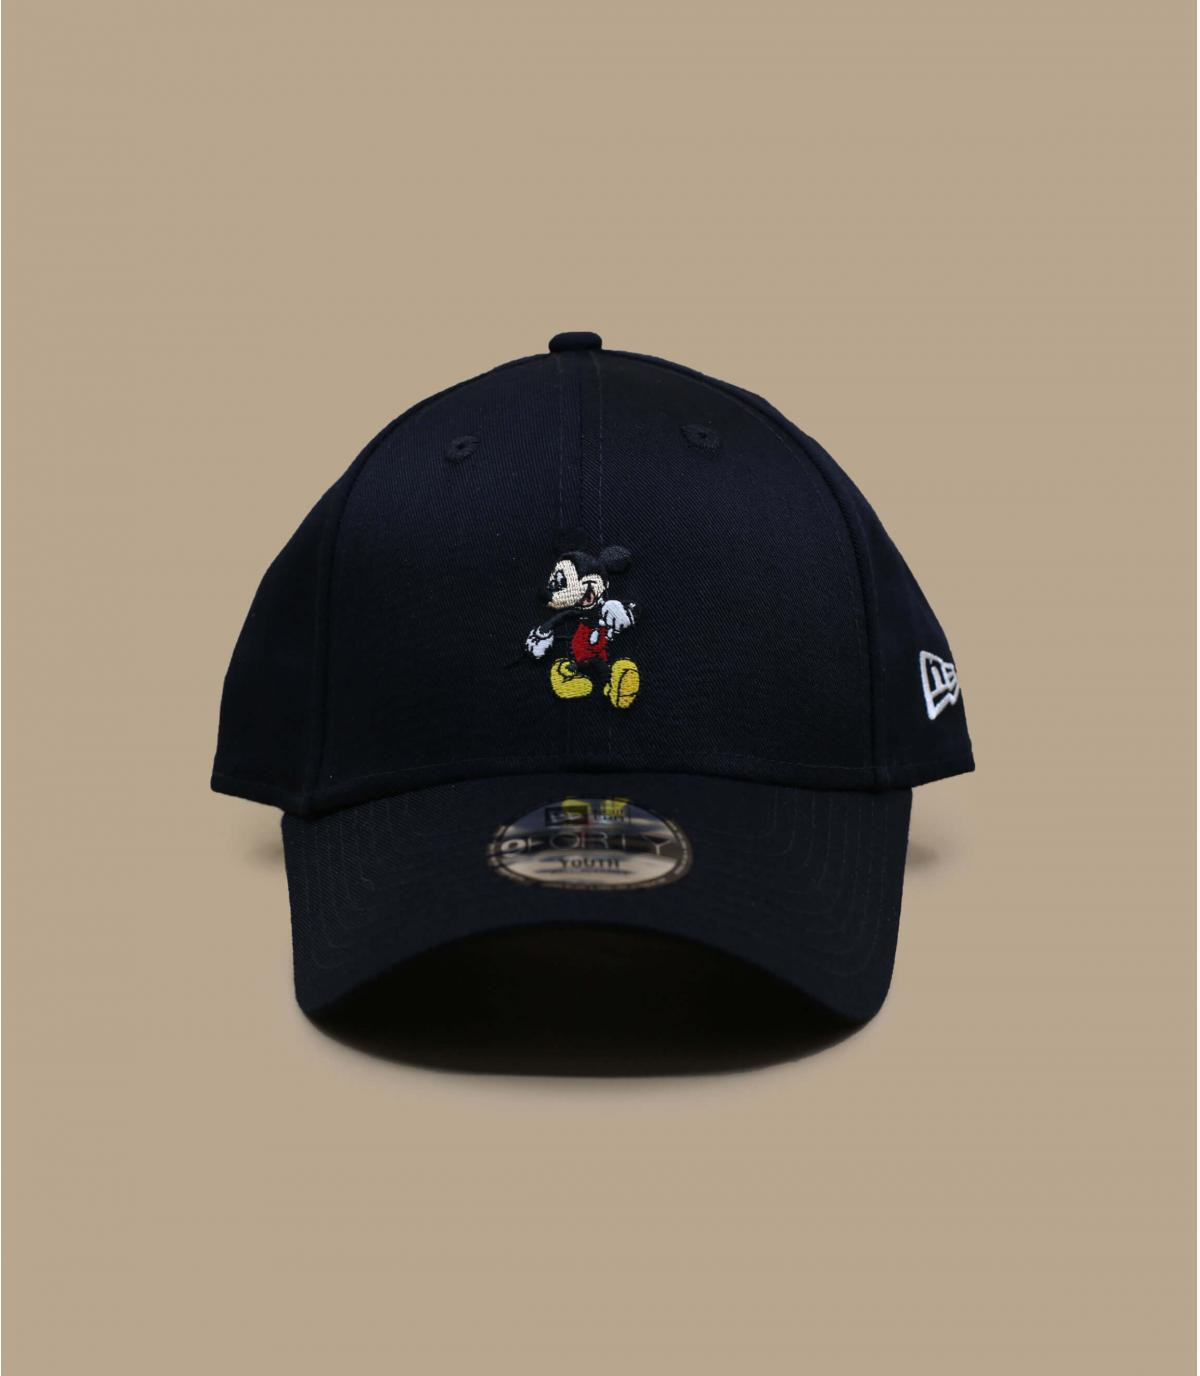 Details Kids Mickey Mouse navy - Abbildung 2